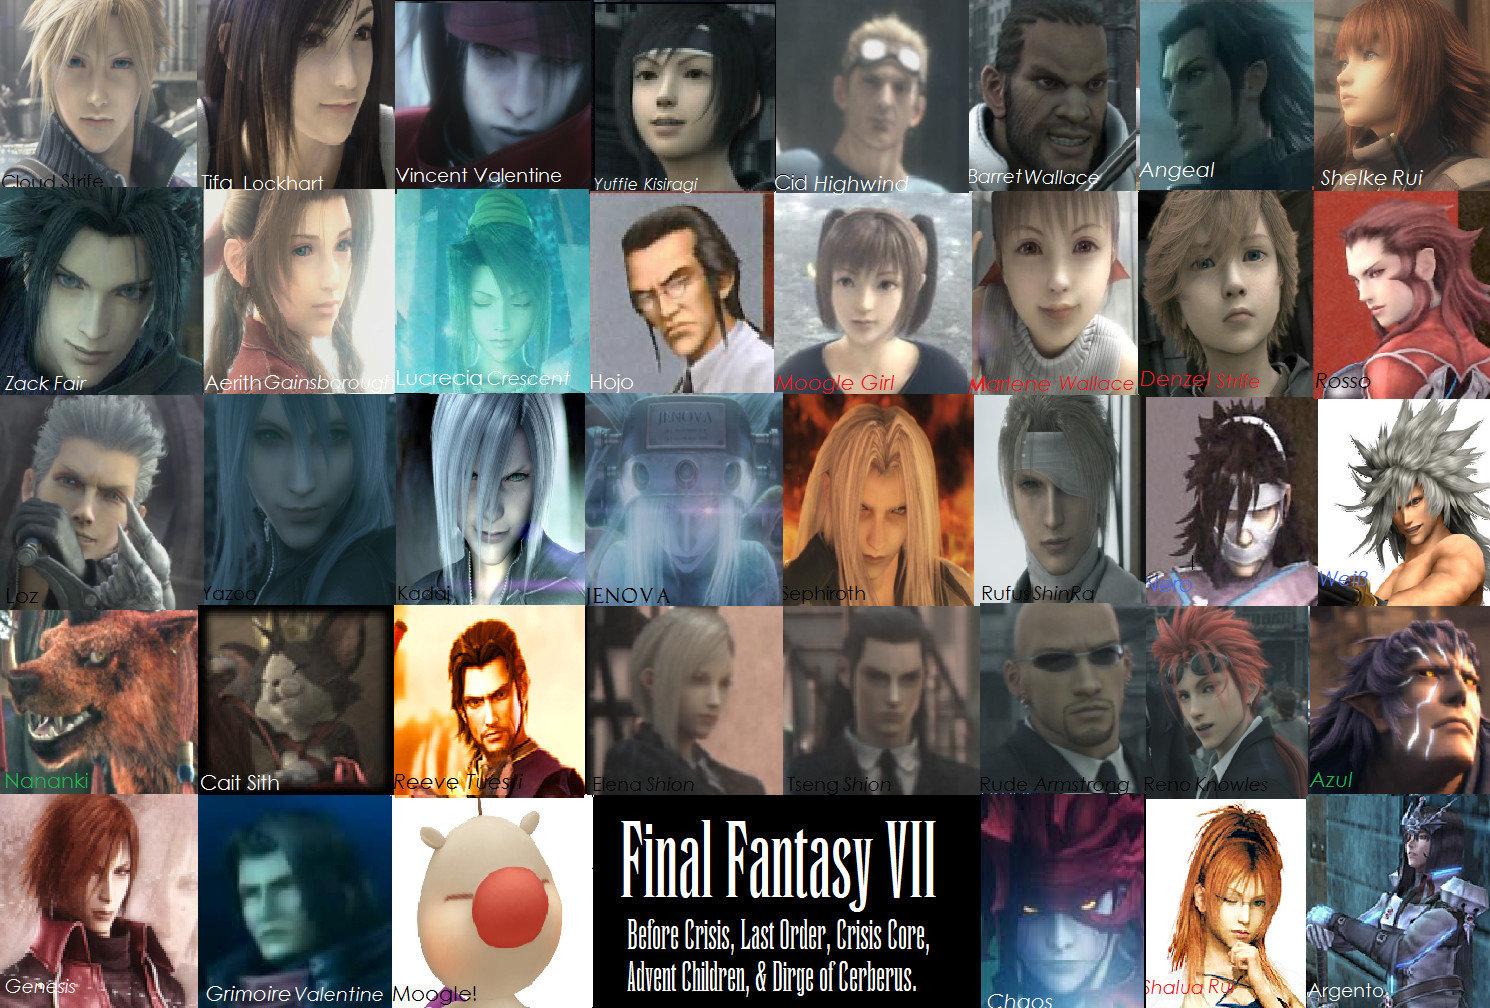 Final Fantasy VII wallpaper by CAiTsIthofShinRa 1490x1008